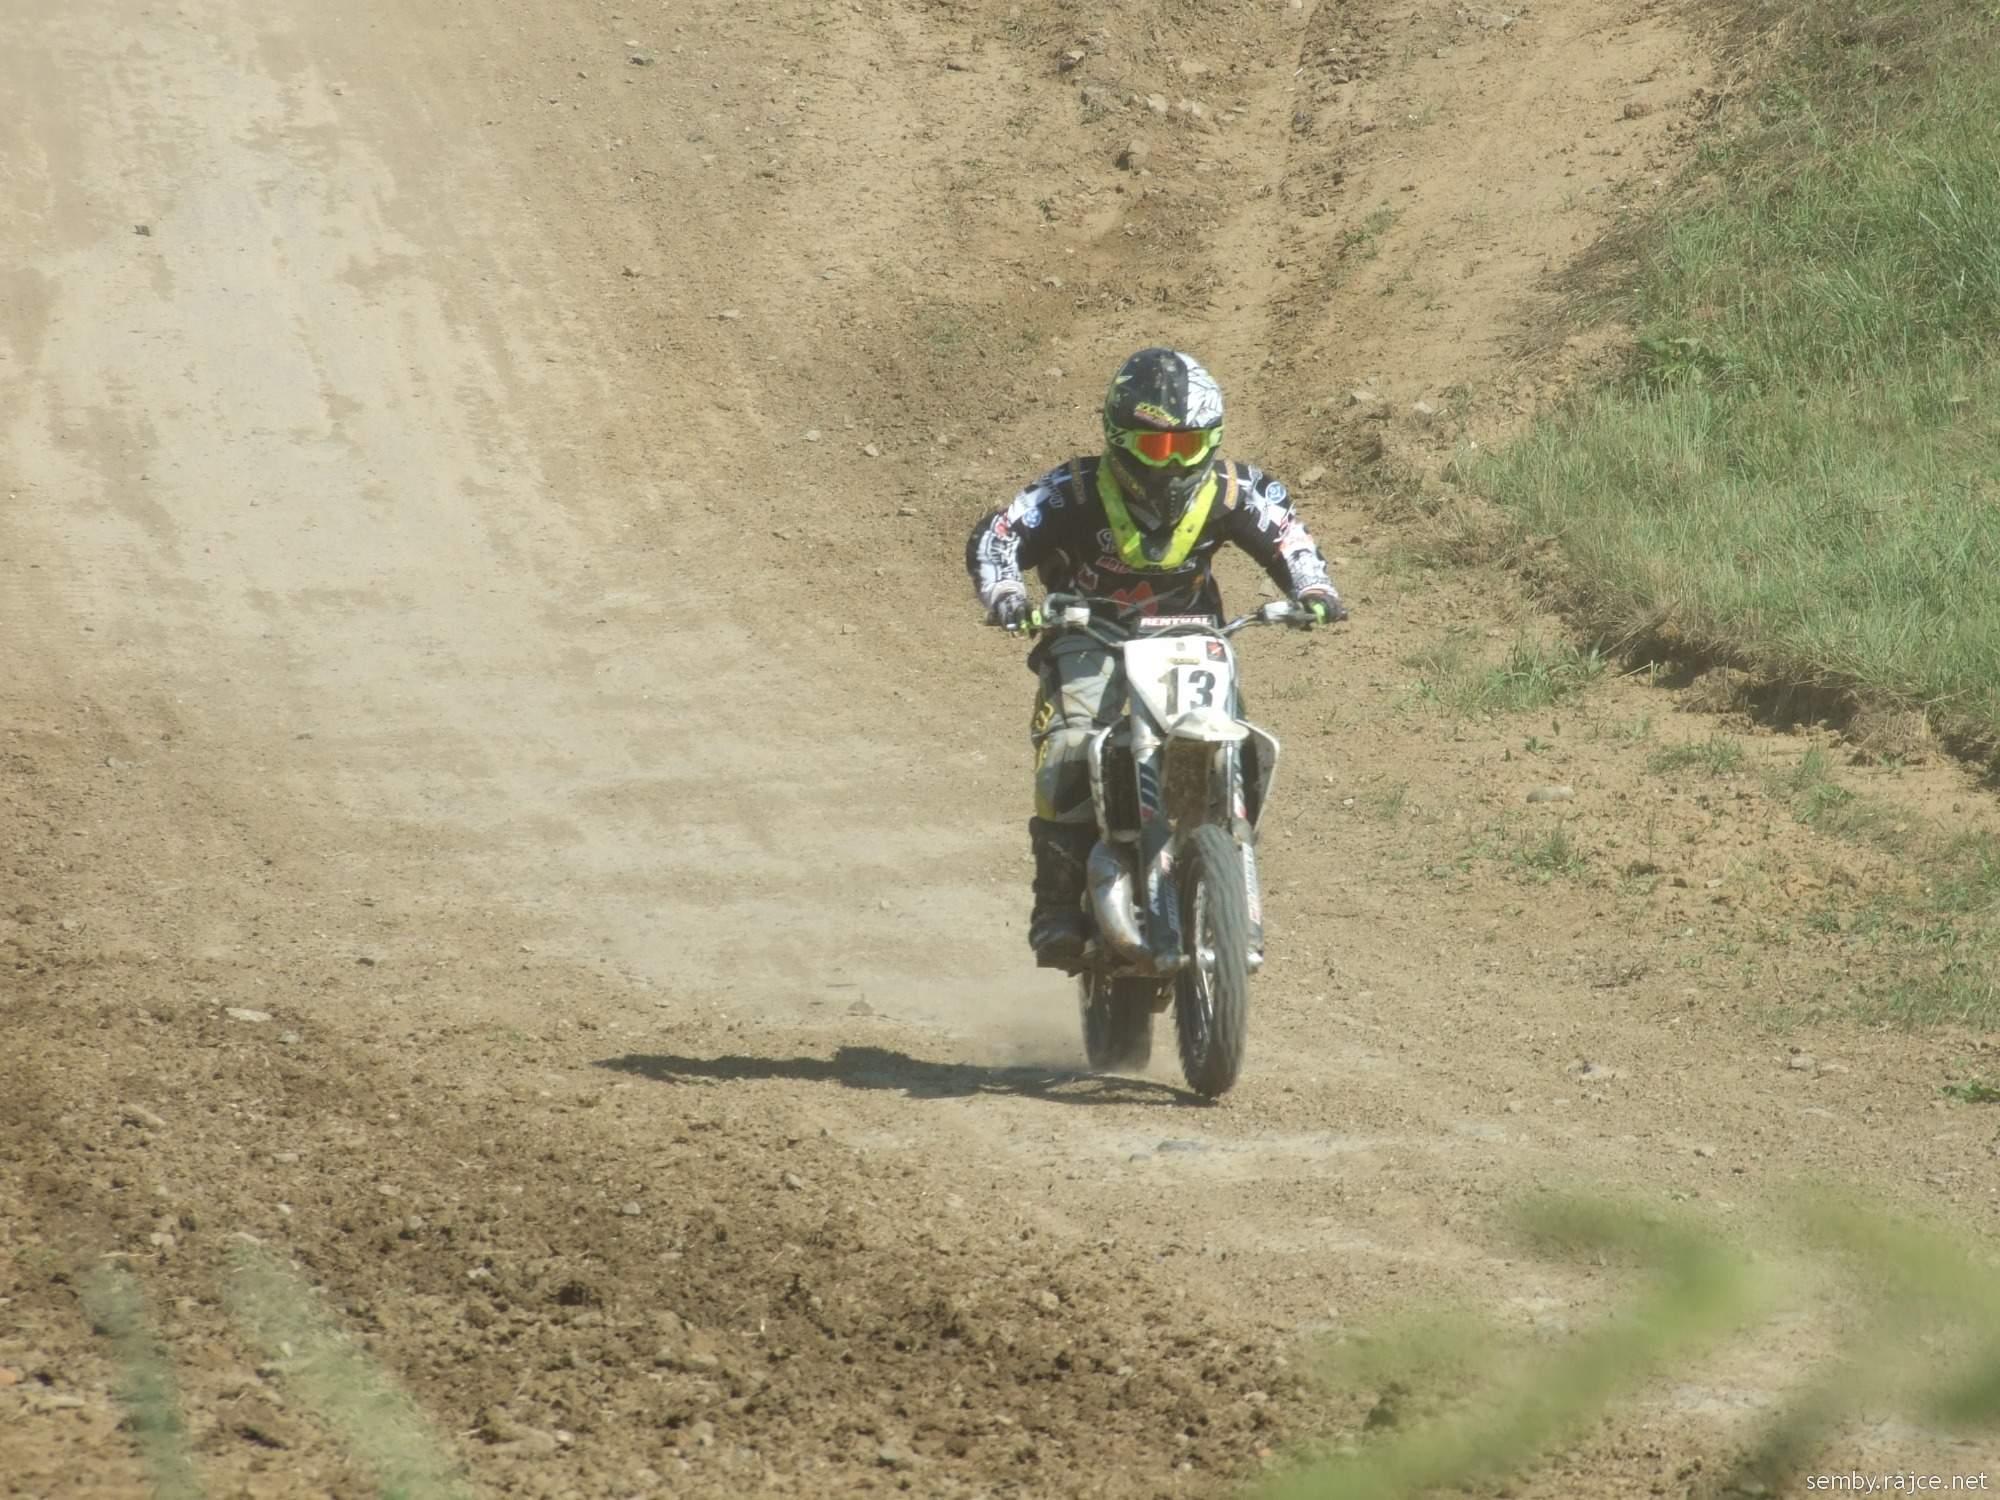 JOSEF MANA - ÚAMK AMK MXA PREROV MOTO ADAMEK PRUSINOVICE 2020